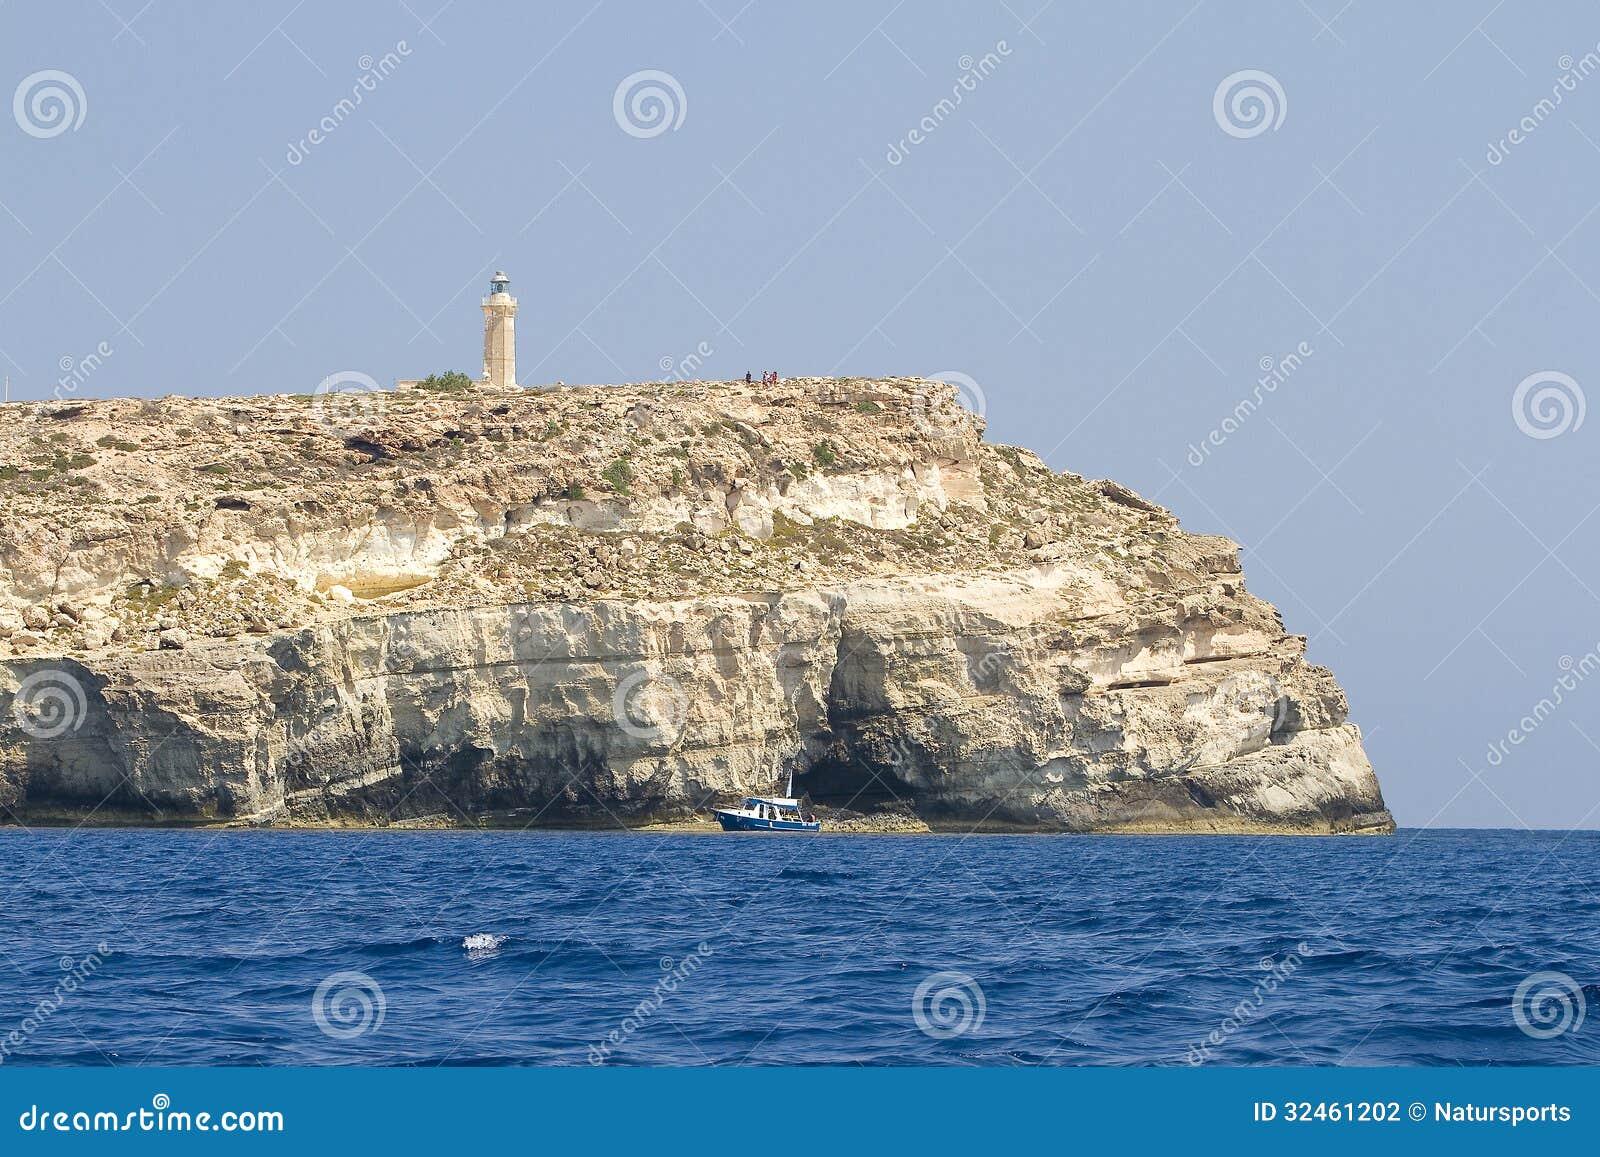 Lighthouse of Lampedusa